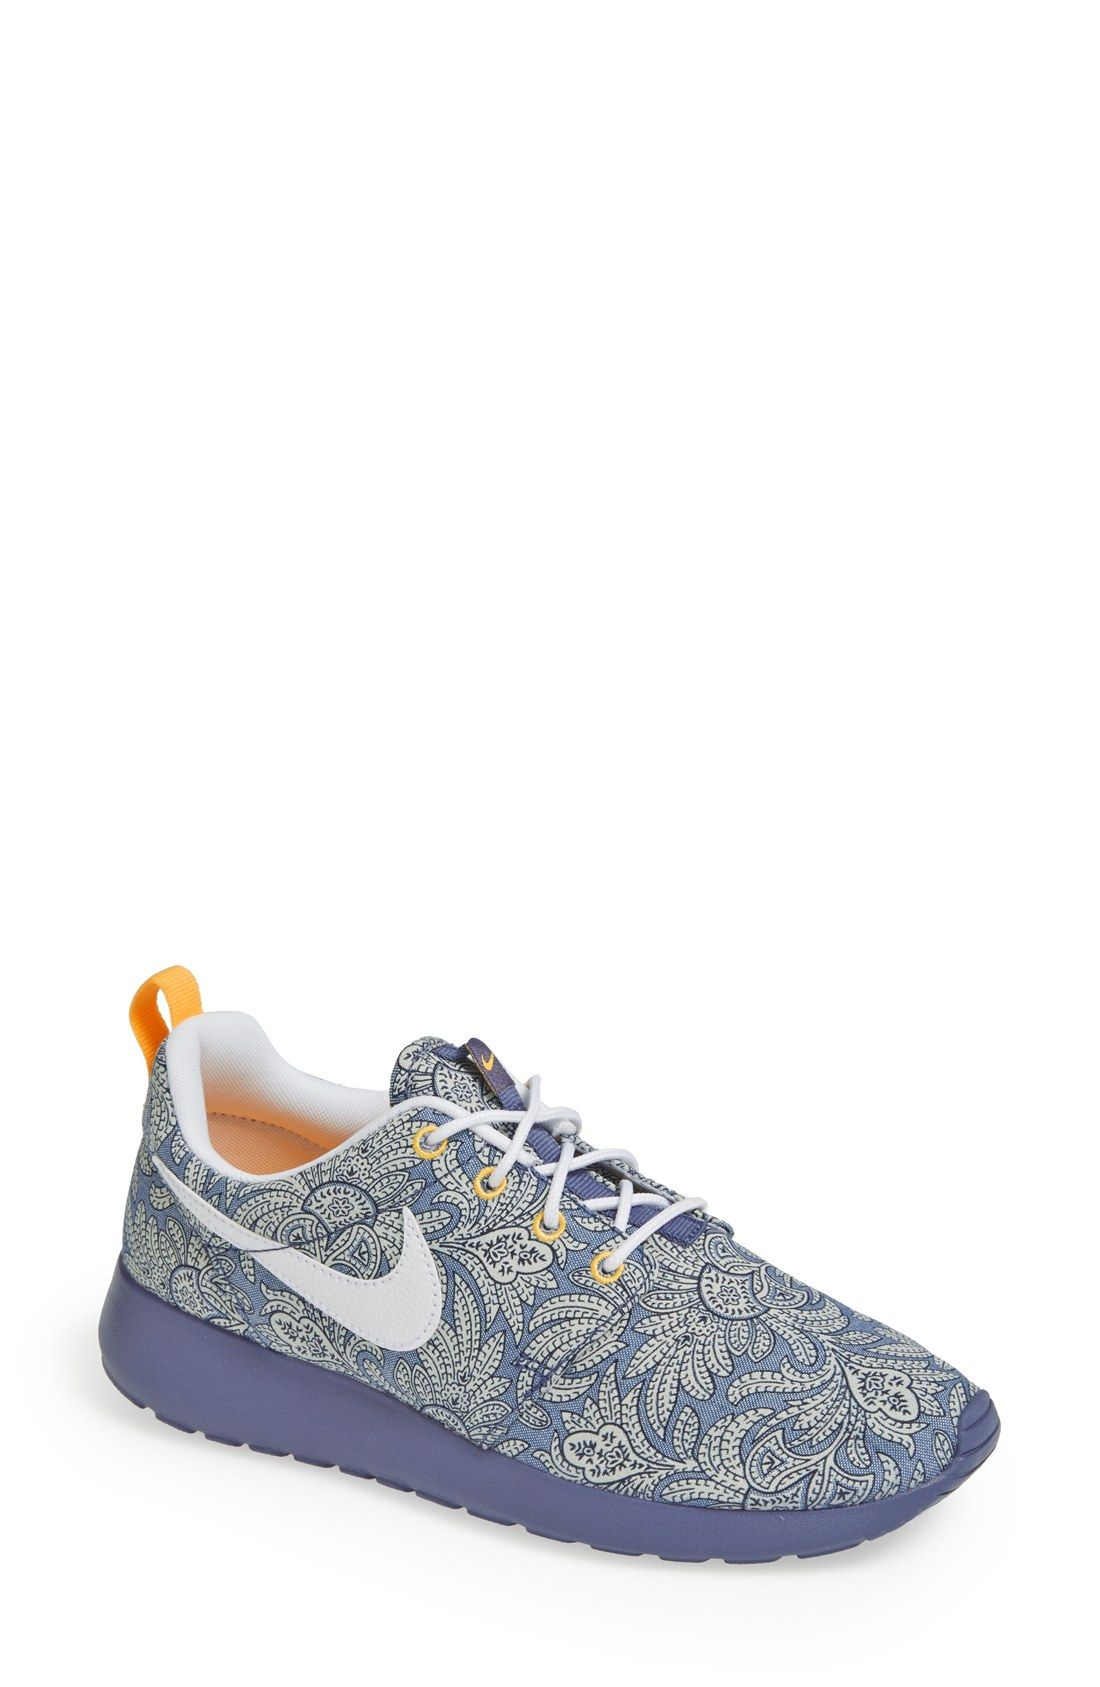 96daf0629d39 Nike  Roshe Run - Liberty  Sneaker (Women)